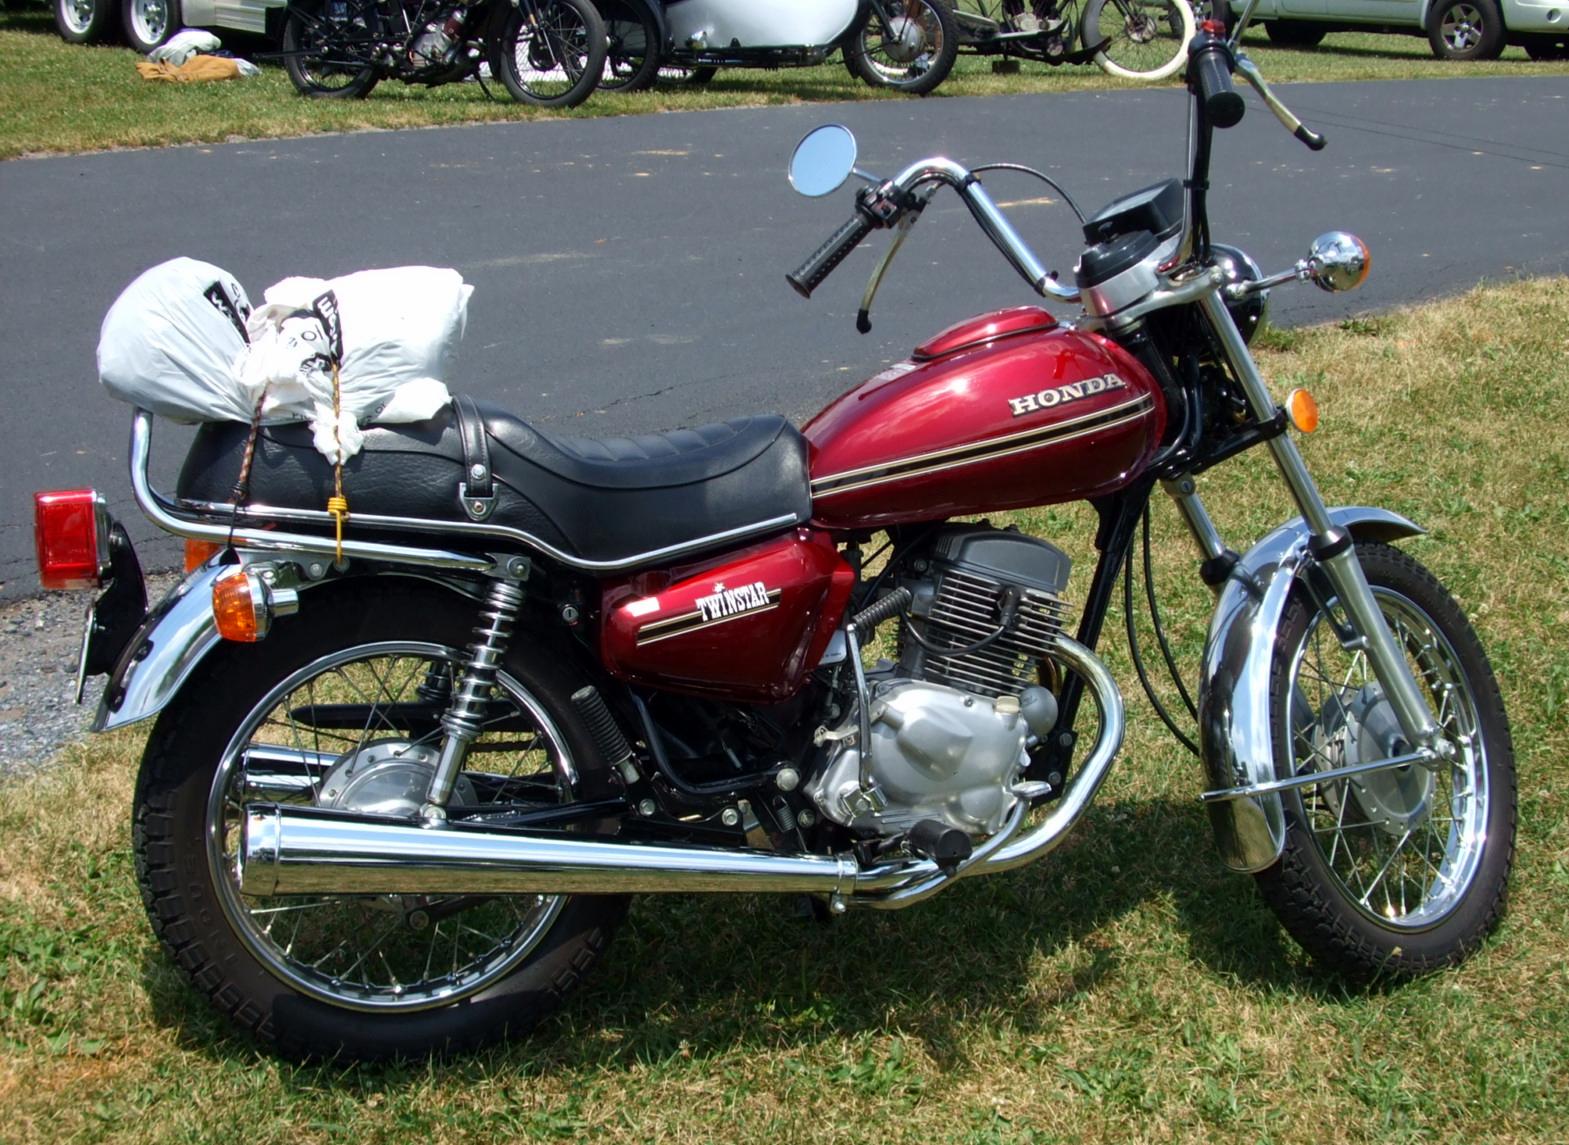 Craigslist iowa motorcycles - Buffalo craigslist farm and garden ...